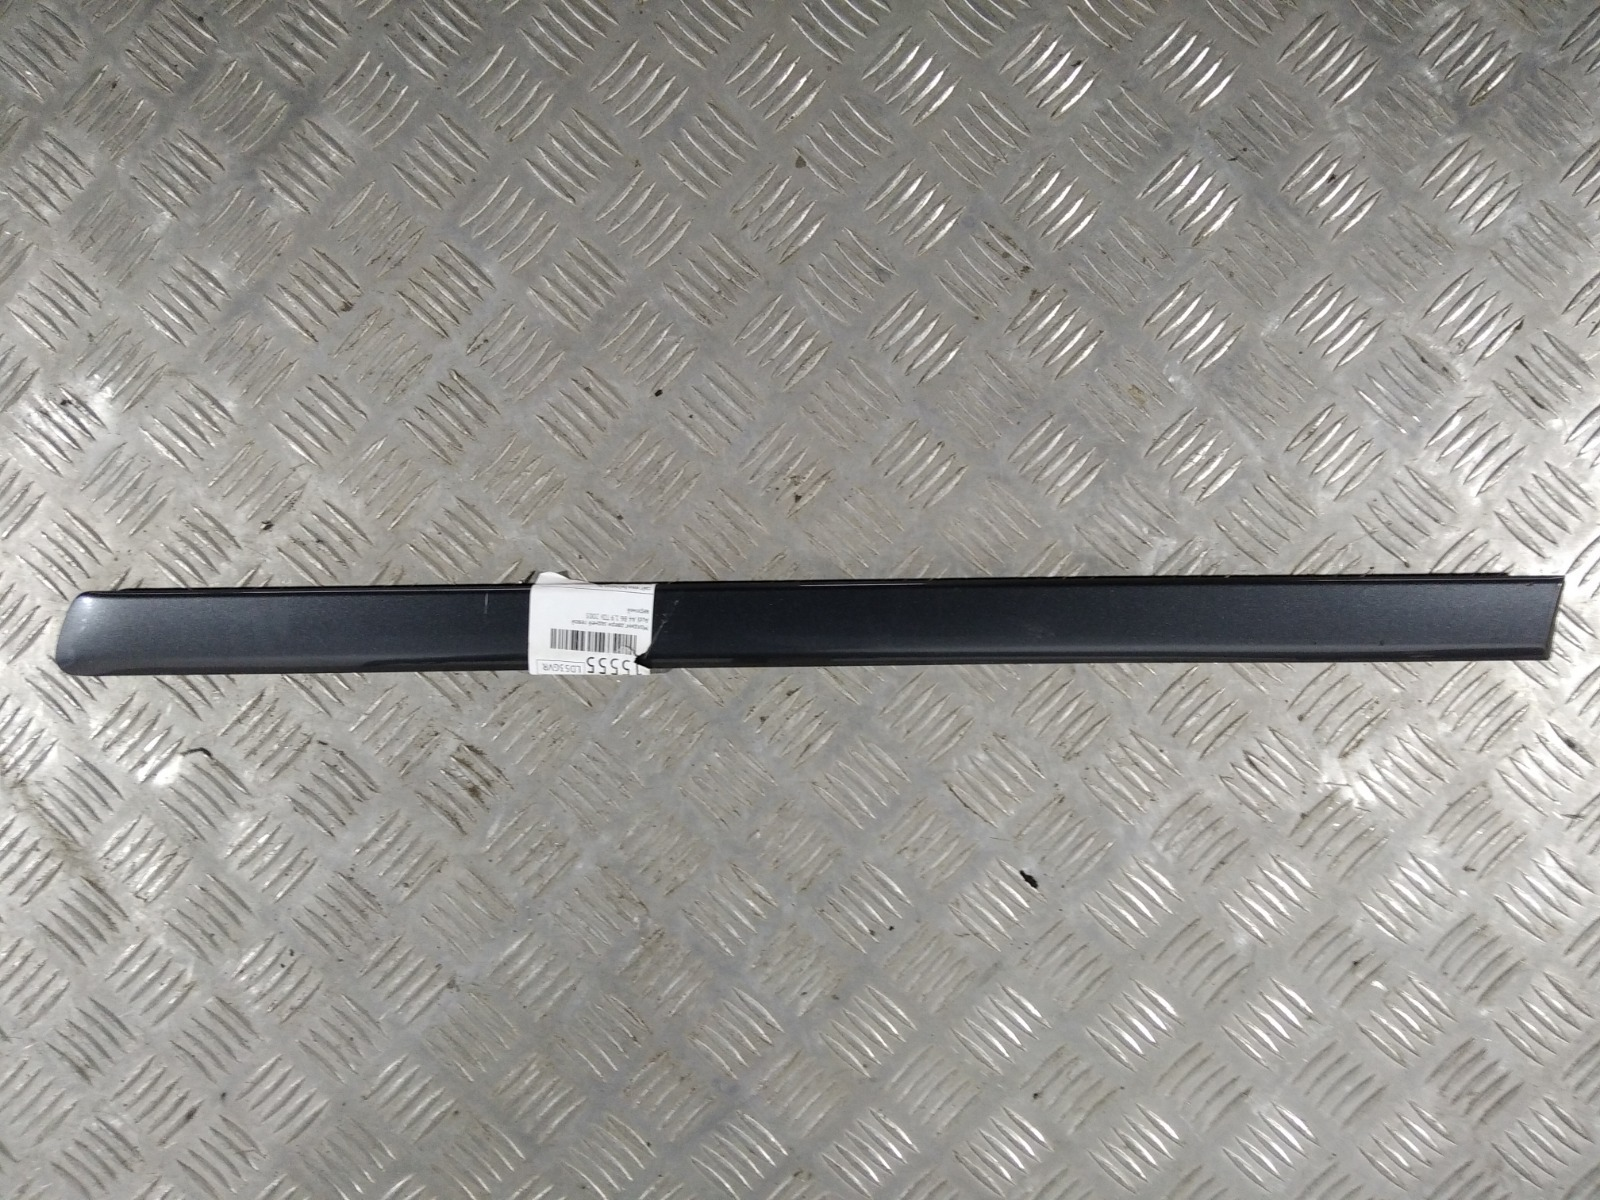 Молдинг двери задней левой Audi A4 B6 1.9 TDI 2003 (б/у)